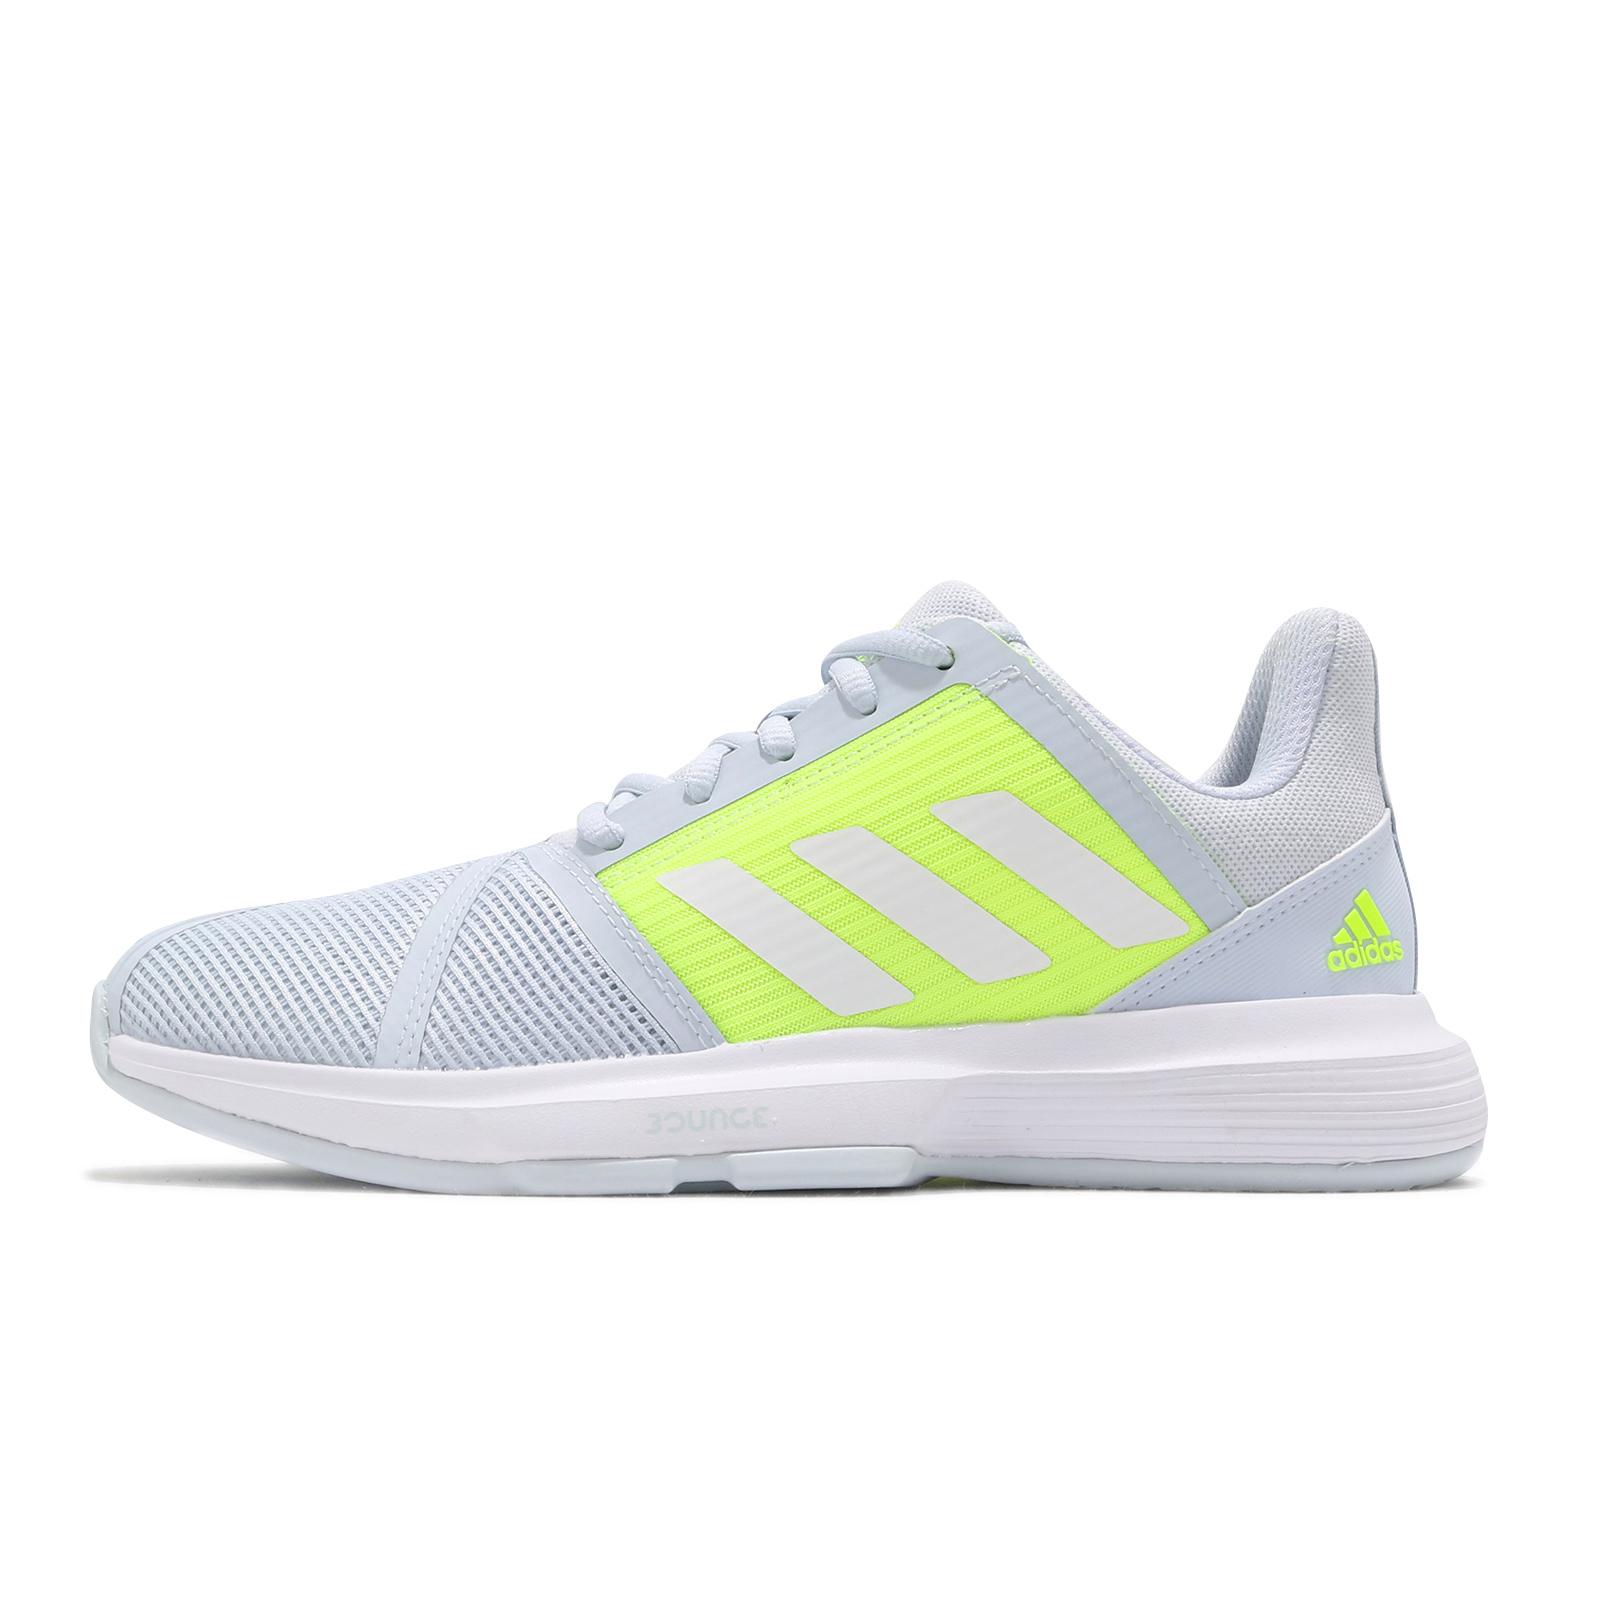 adidas 網球鞋 CourtJam Bounce W 灰 螢光黃 女鞋 運動鞋 愛迪達【ACS】 FX1524